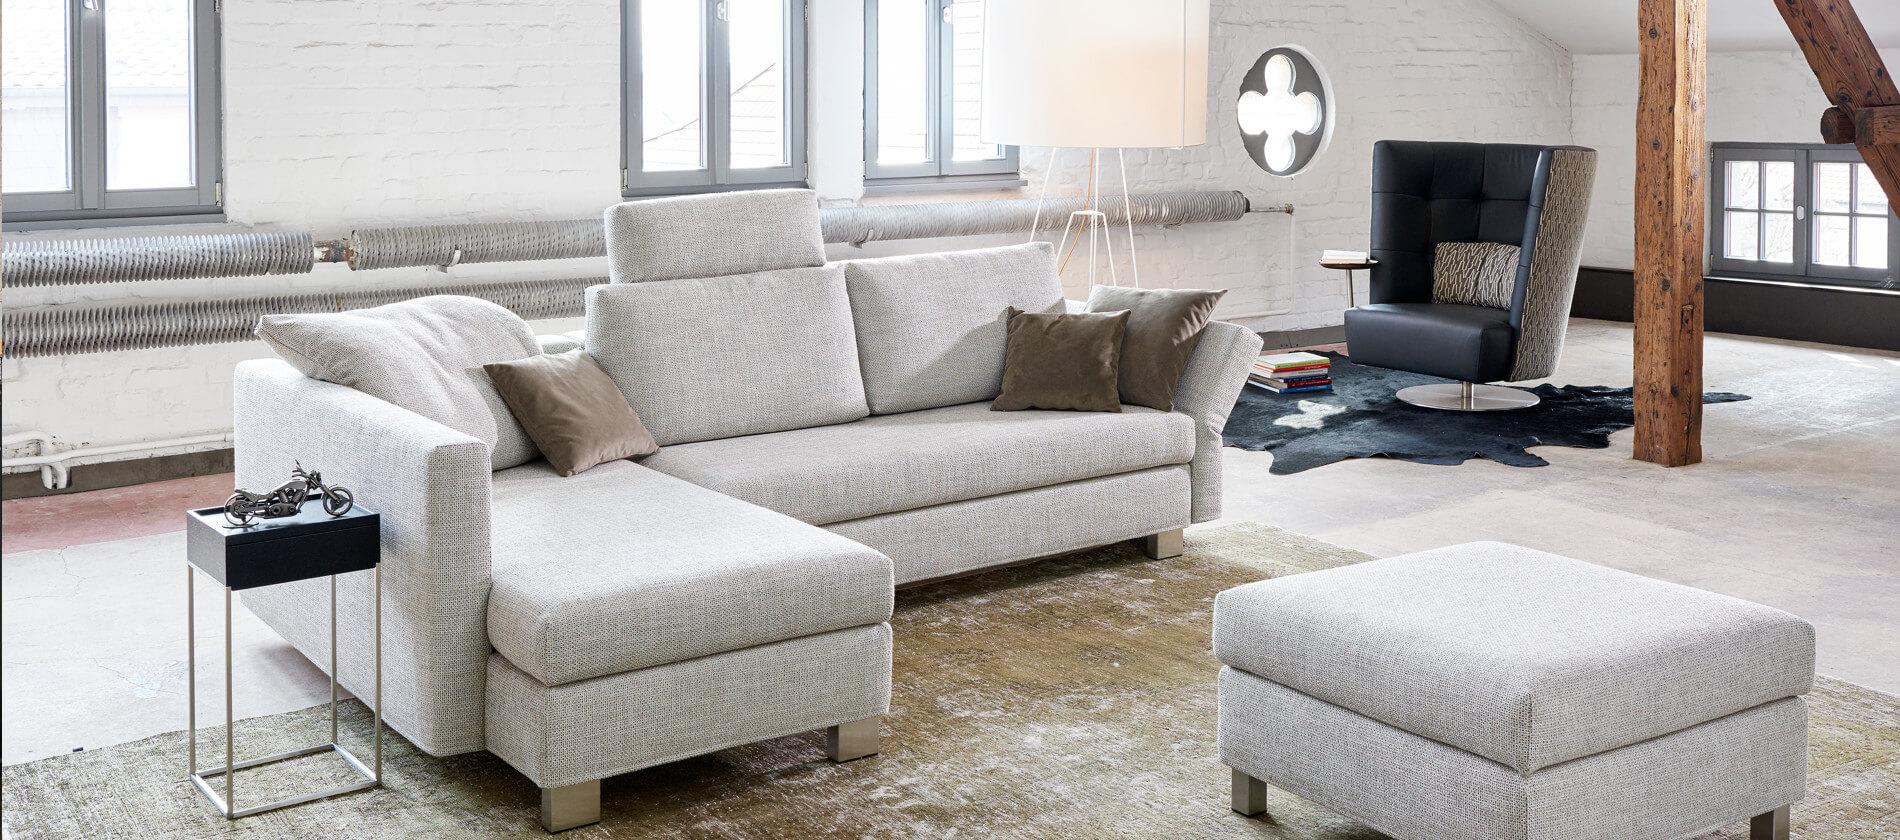 Full Size of Goodlife Sofa Signet Good Life Malaysia Love Furniture Couch Amazon Schlaffunktion Himolla Barock Große Kissen Leinen Schlaf Schlafsofa Liegefläche 160x200 Sofa Goodlife Sofa